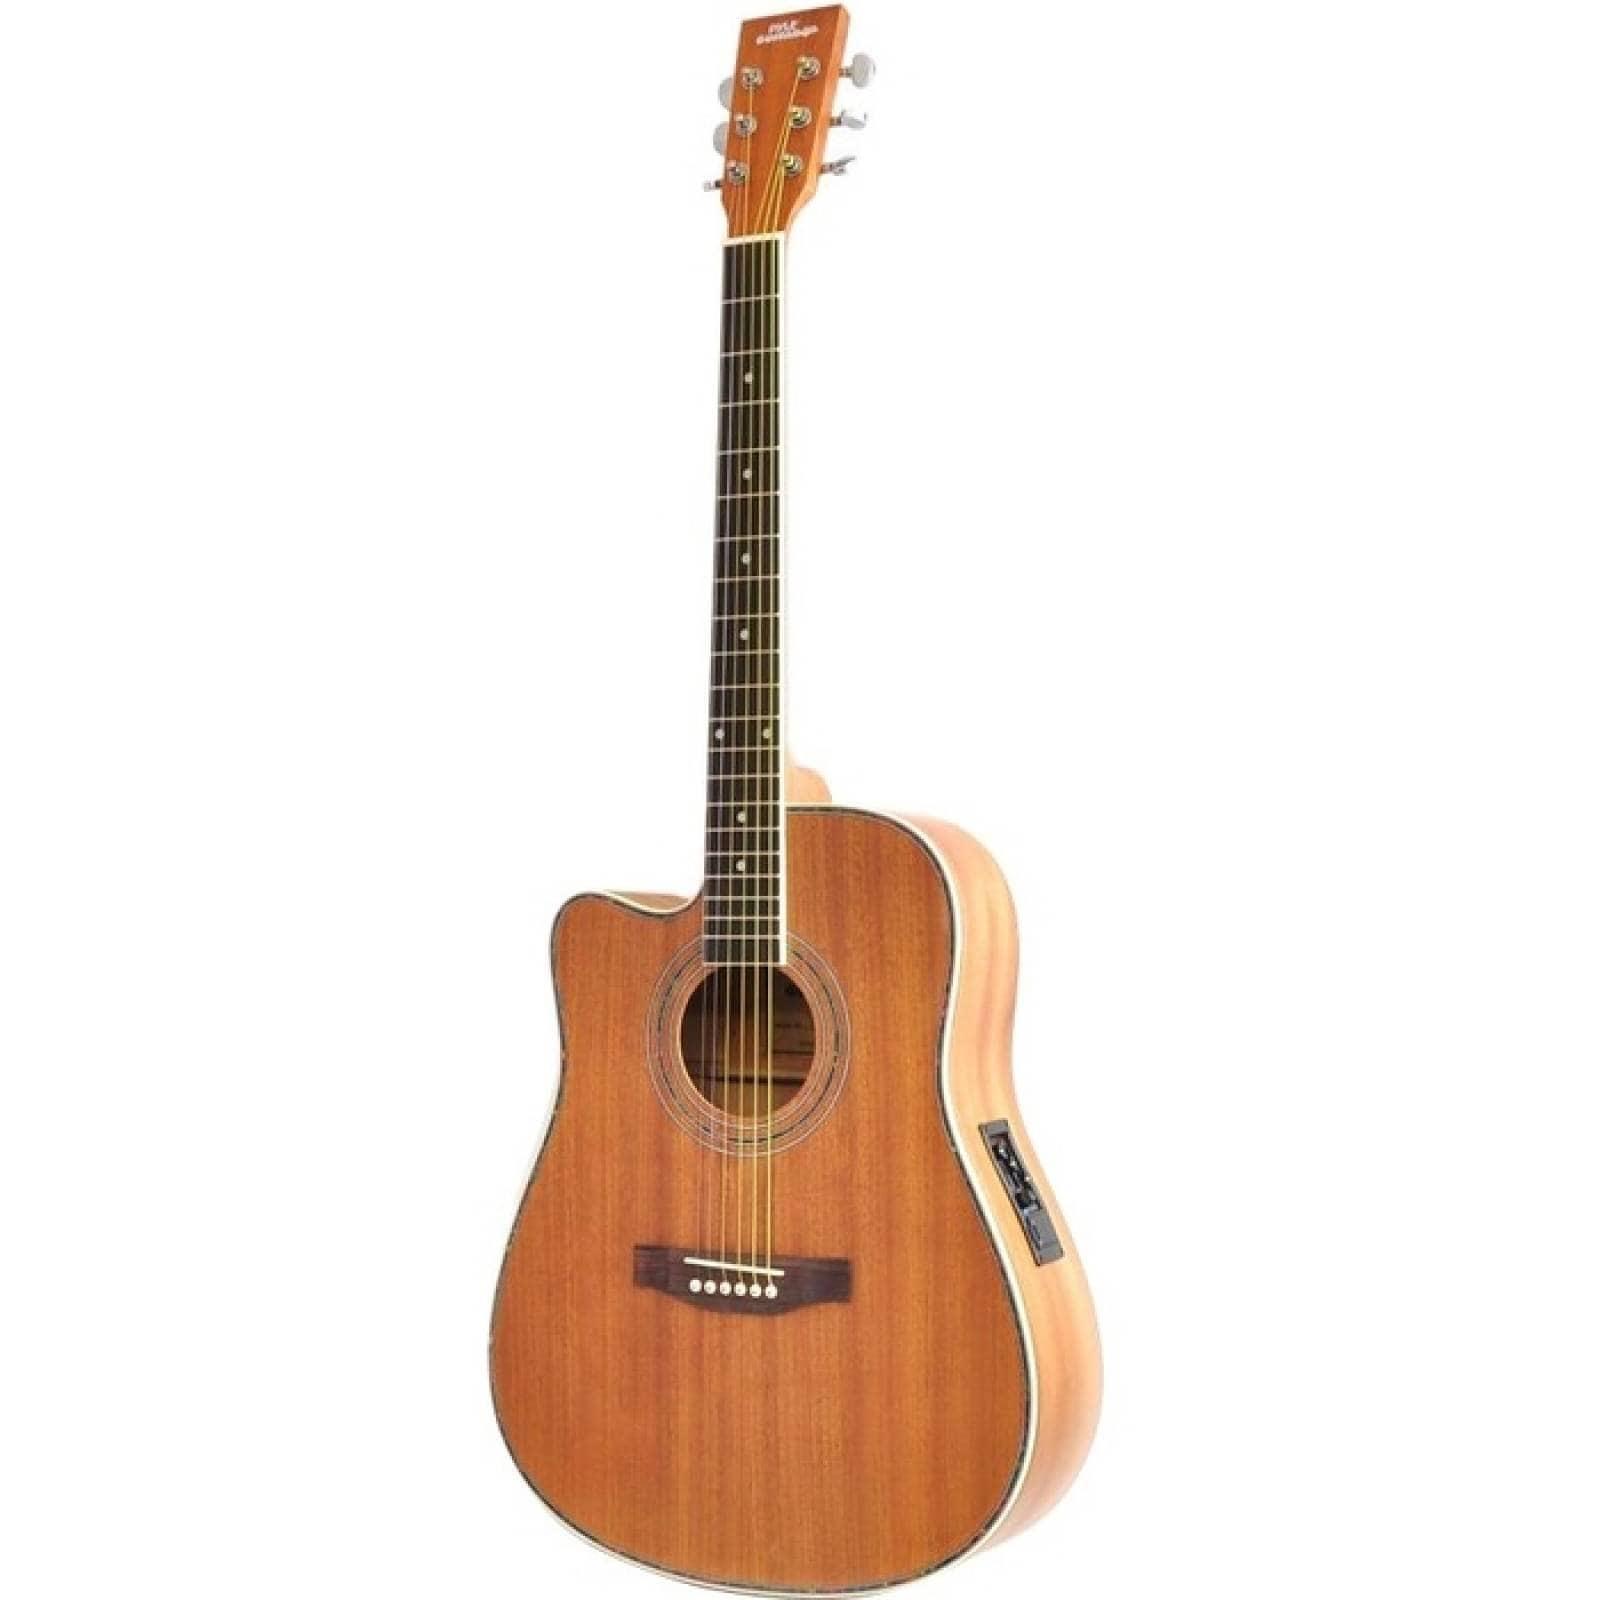 PylePro PGA53LBR Guitarra Elctrica Acstica